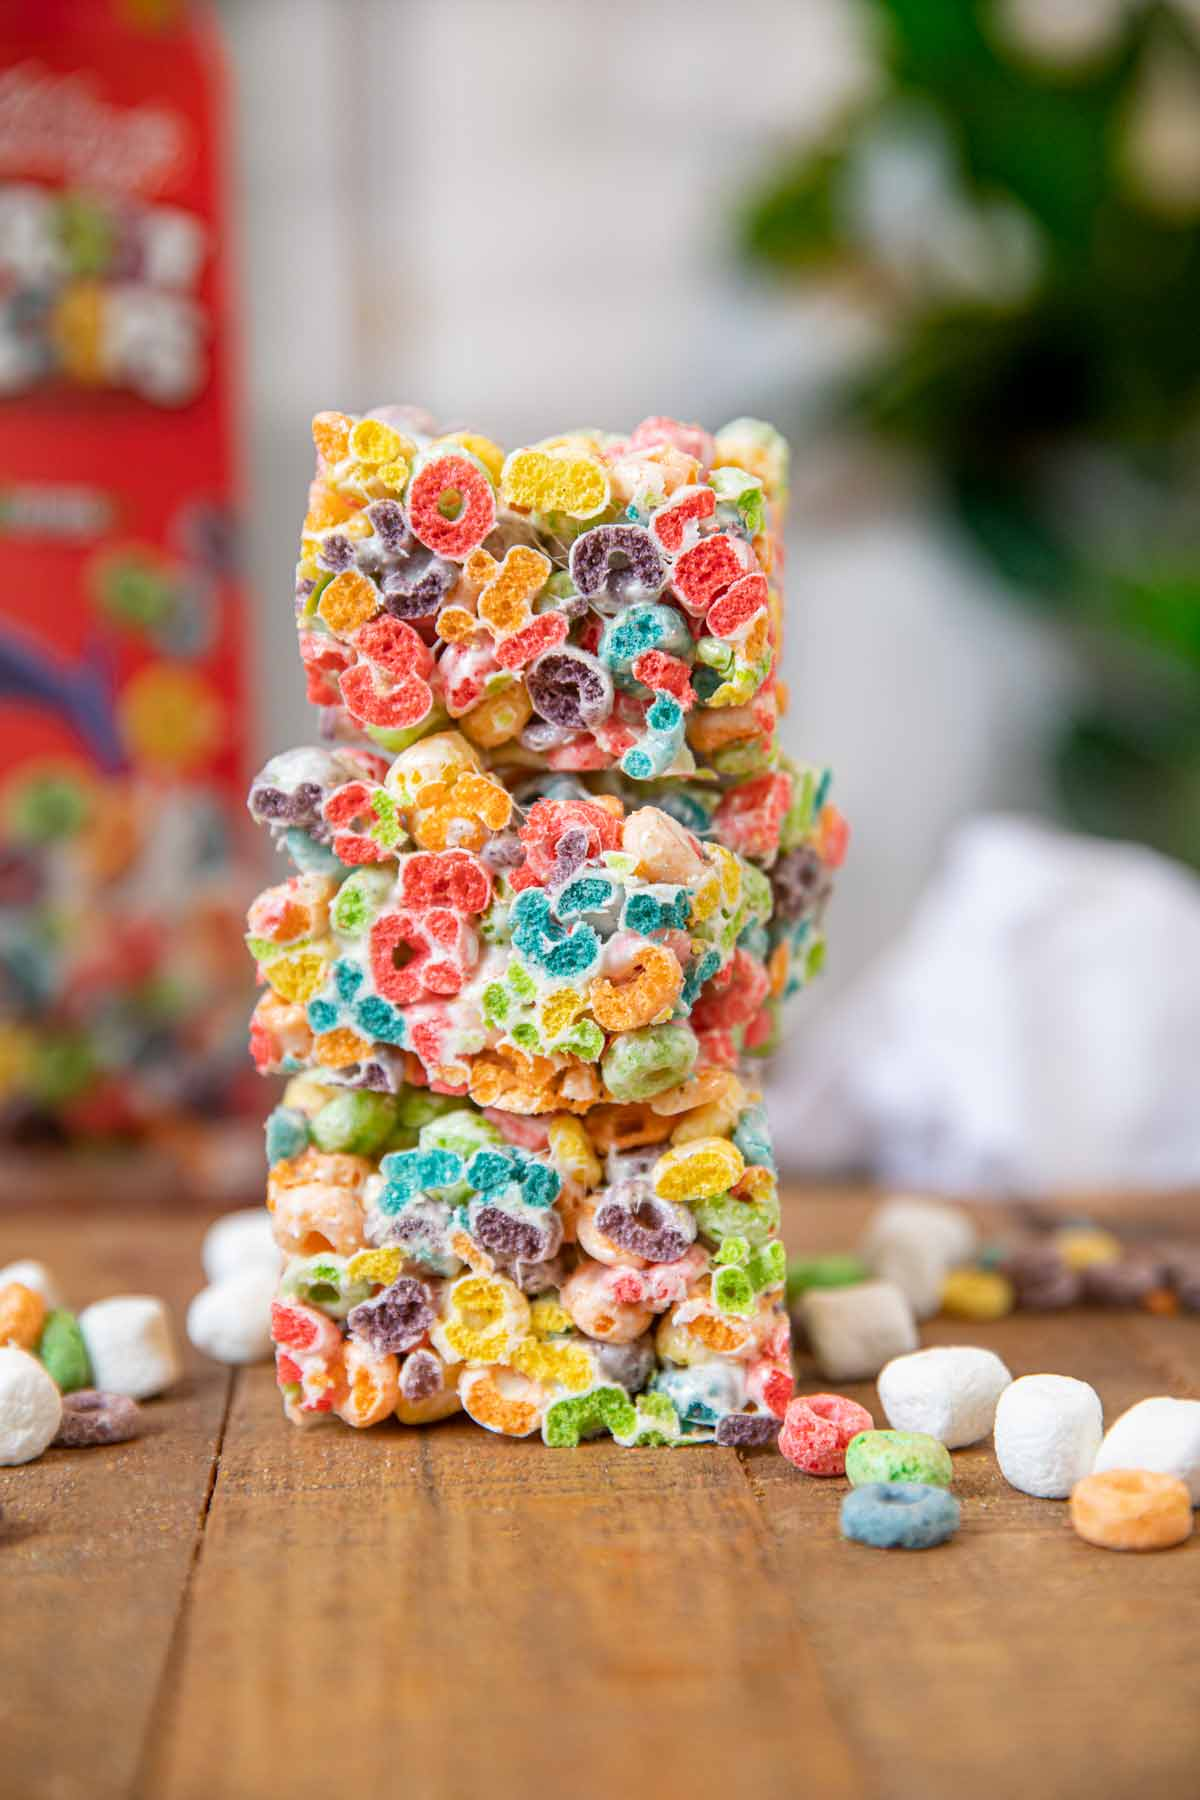 Fruit Loop Cereal Bars in stack